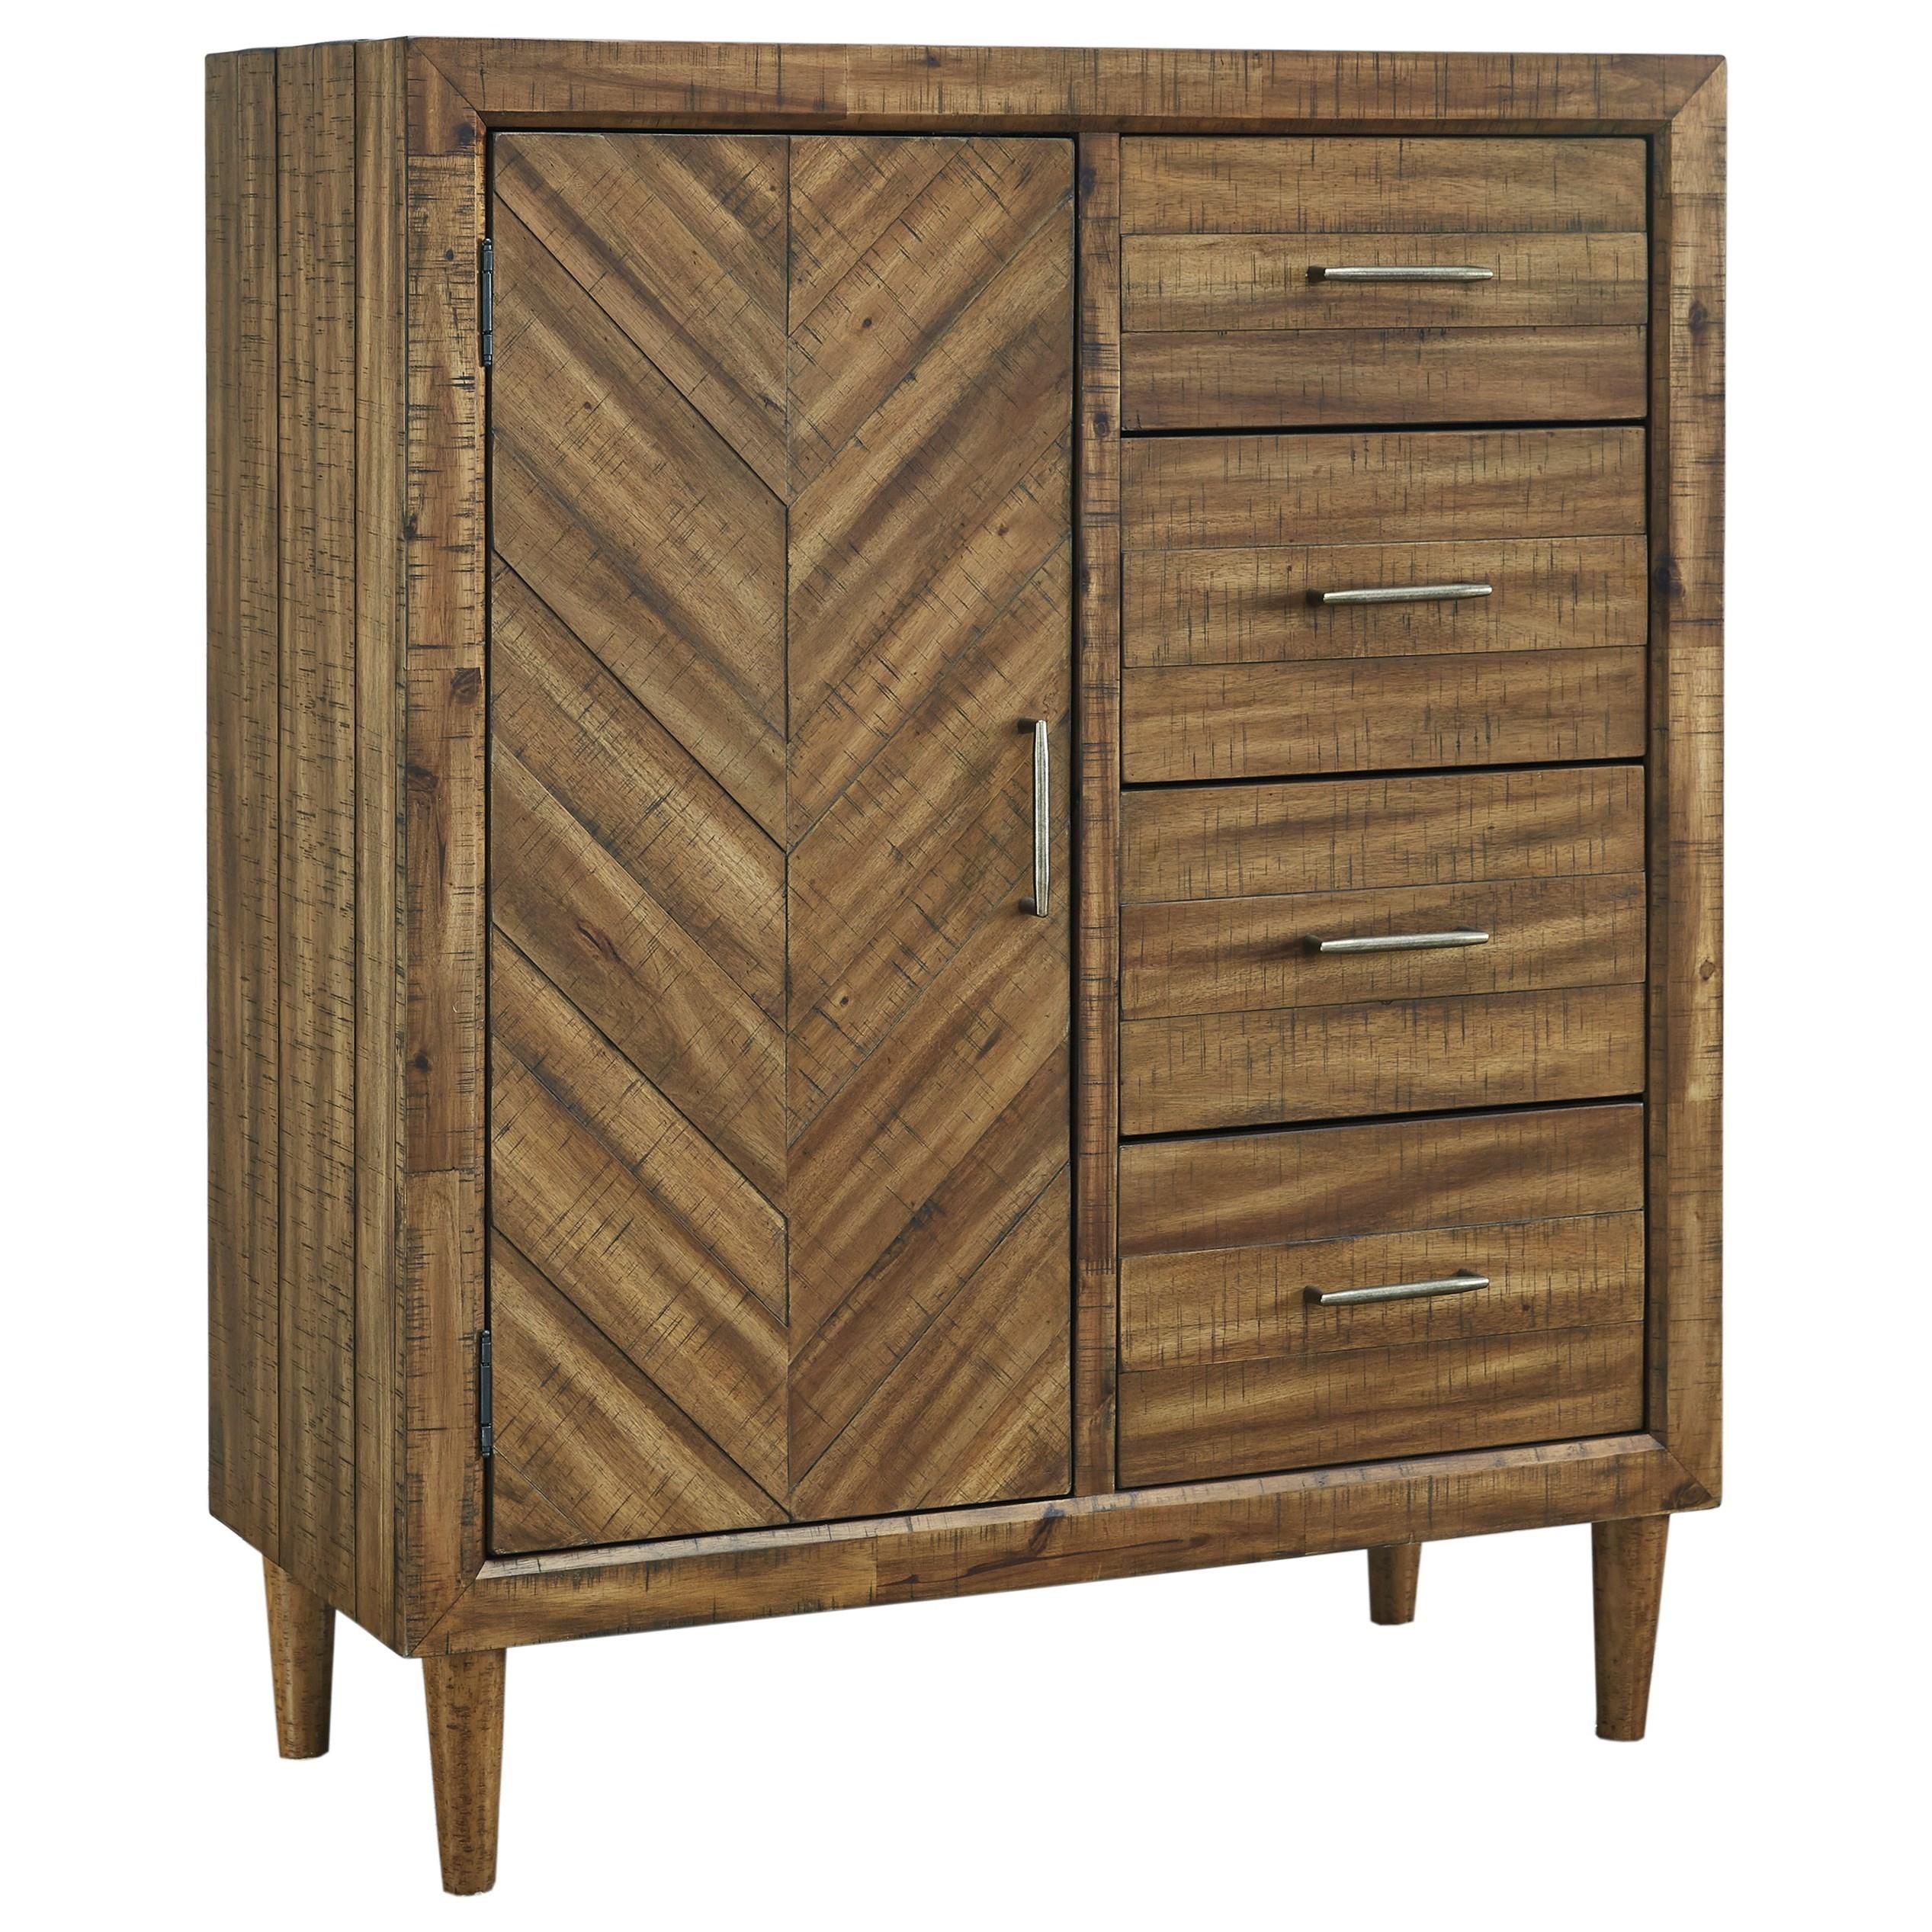 Signature Design by Ashley BroshtanDoor Chest ...  sc 1 st  Furniture and ApplianceMart & Signature Design by Ashley Broshtan B518-48 Mid-Century Modern Door ...